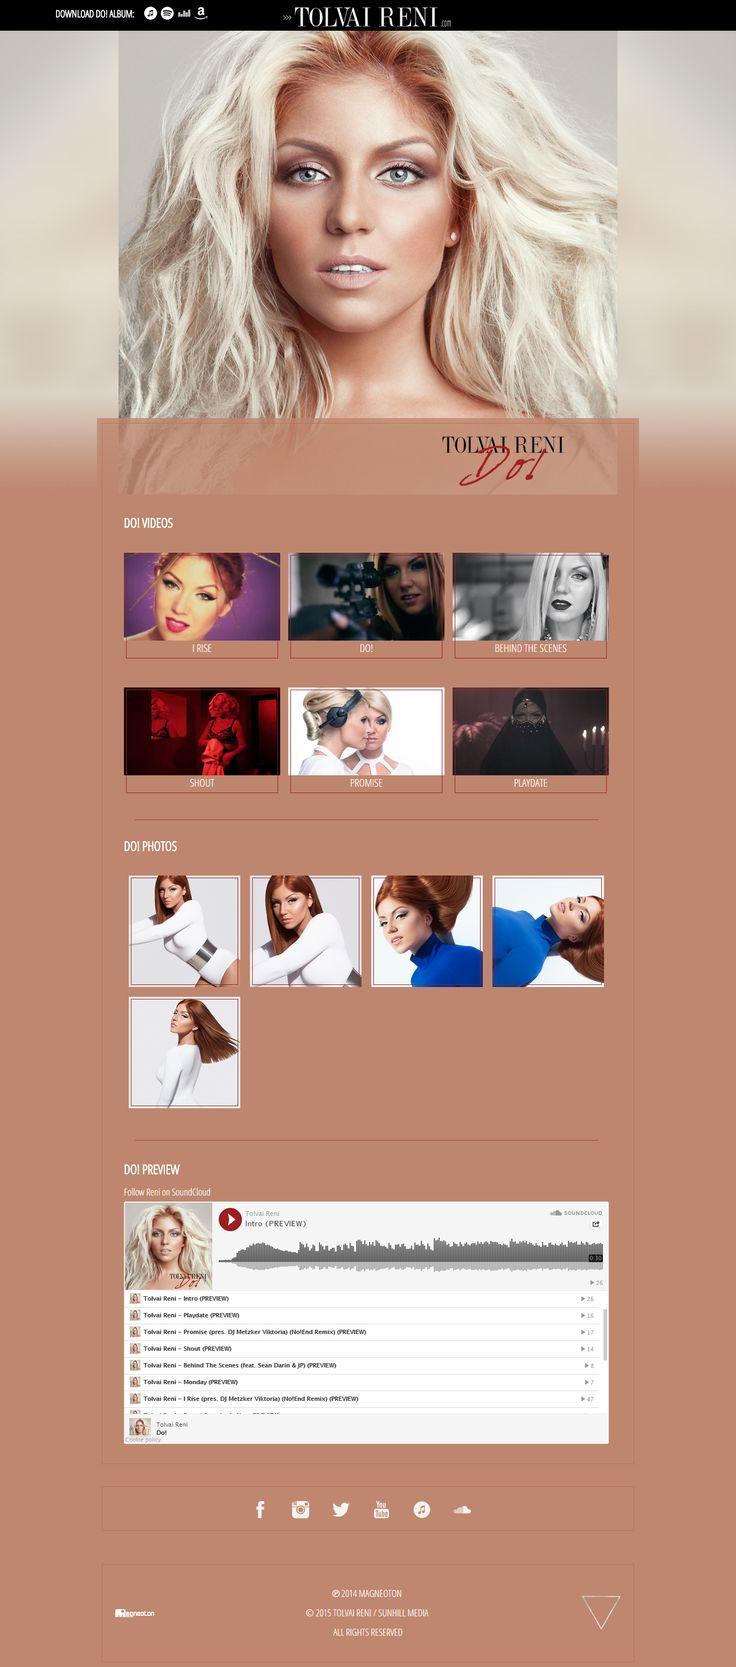 Tolvai Reni - Do! Album promotion web design & development http://do.tolvaireni.com